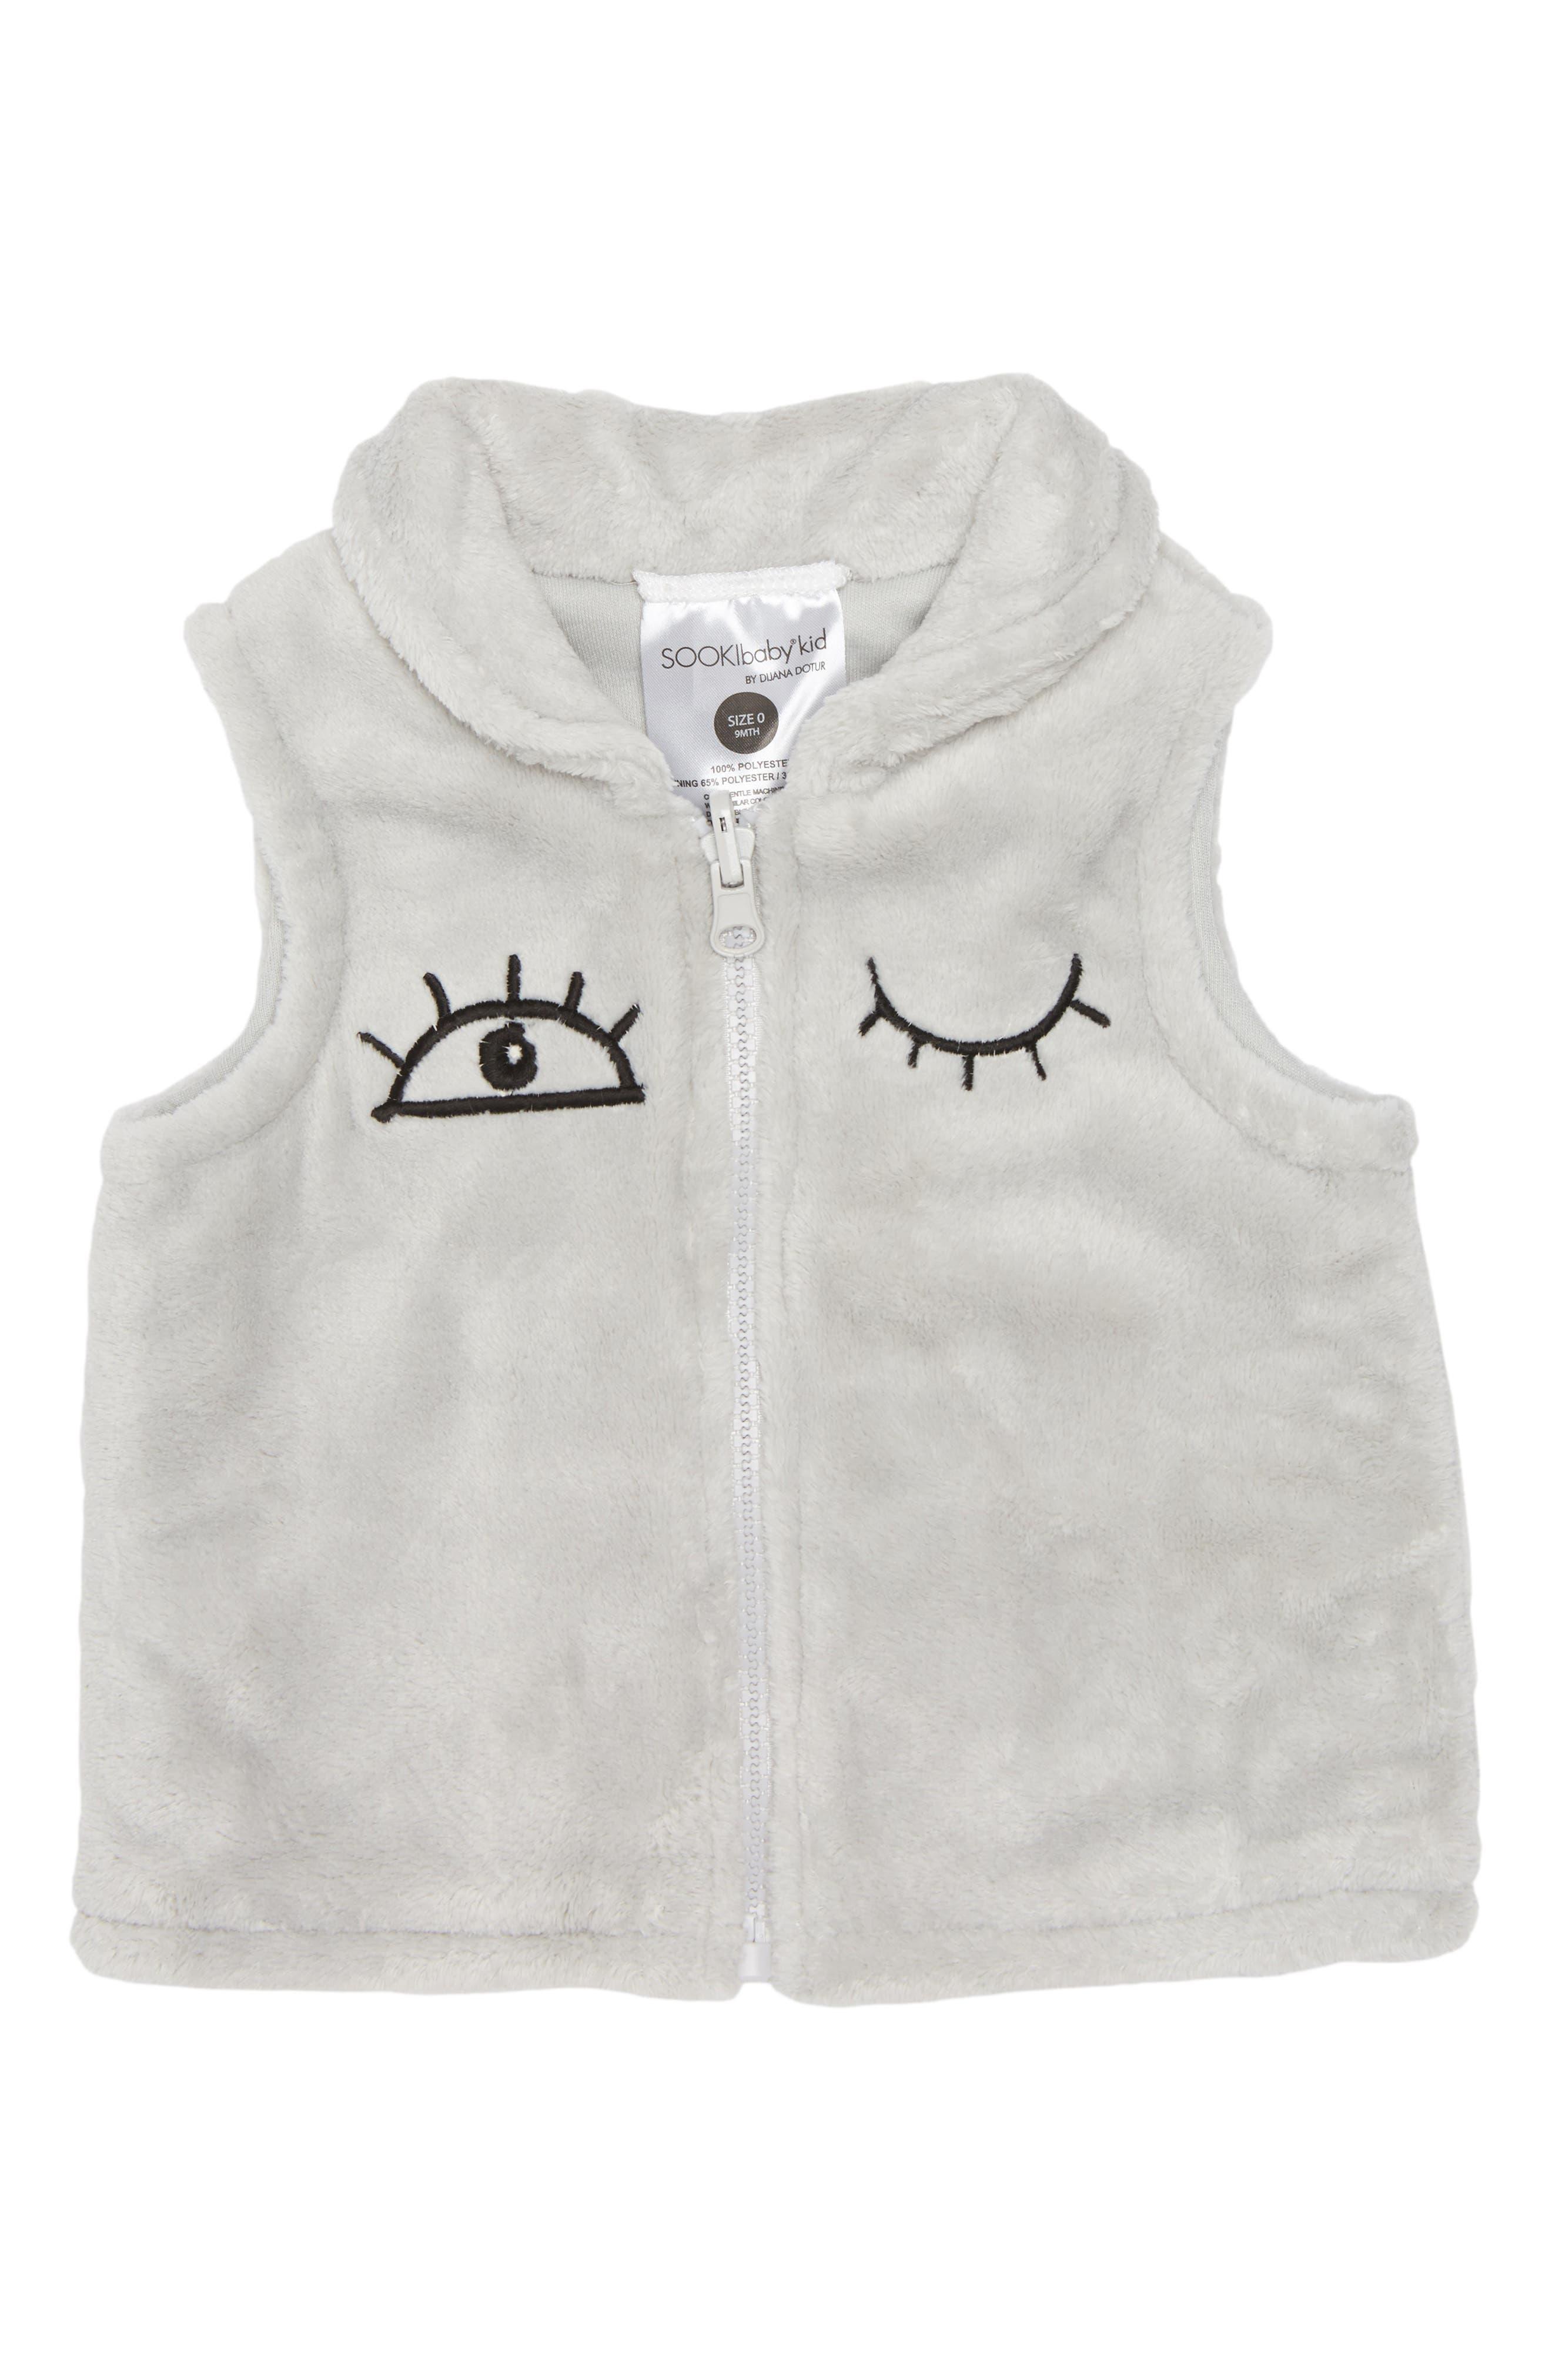 I Love You Fleece Vest,                             Main thumbnail 1, color,                             035